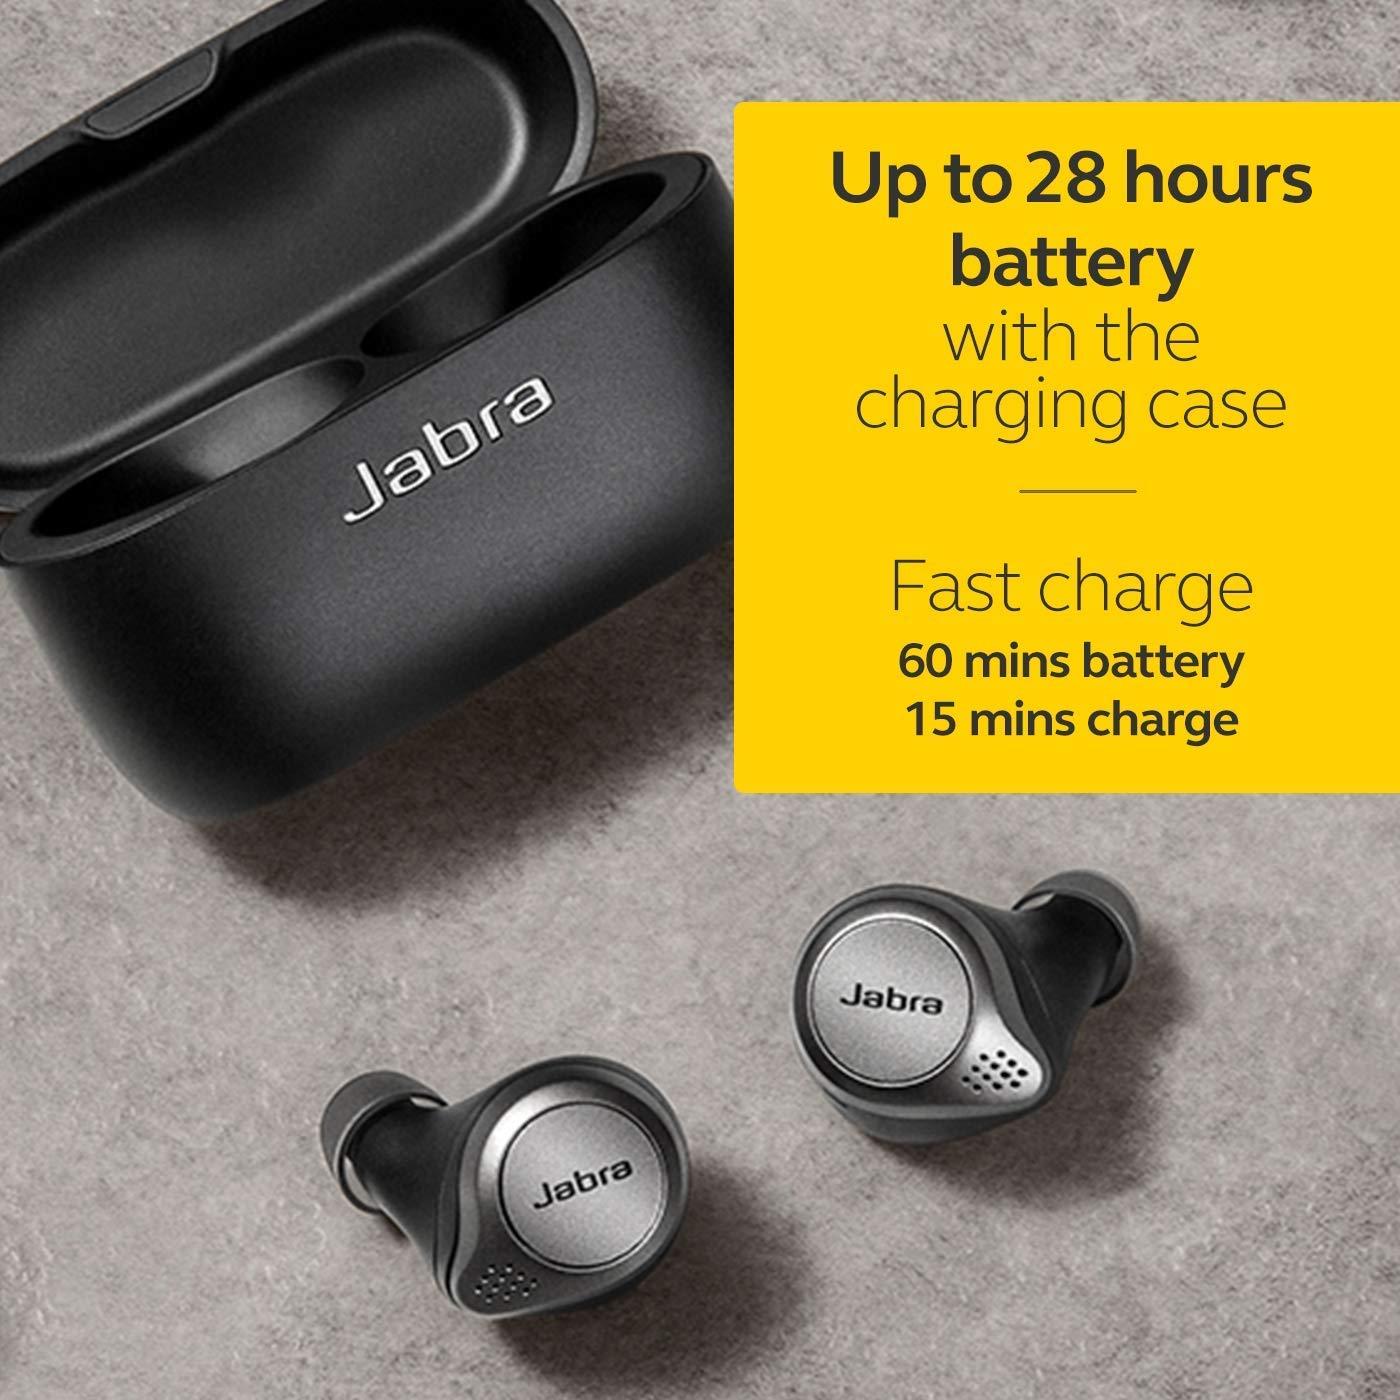 Jabra Elite 75t True Wireless Earbuds Review